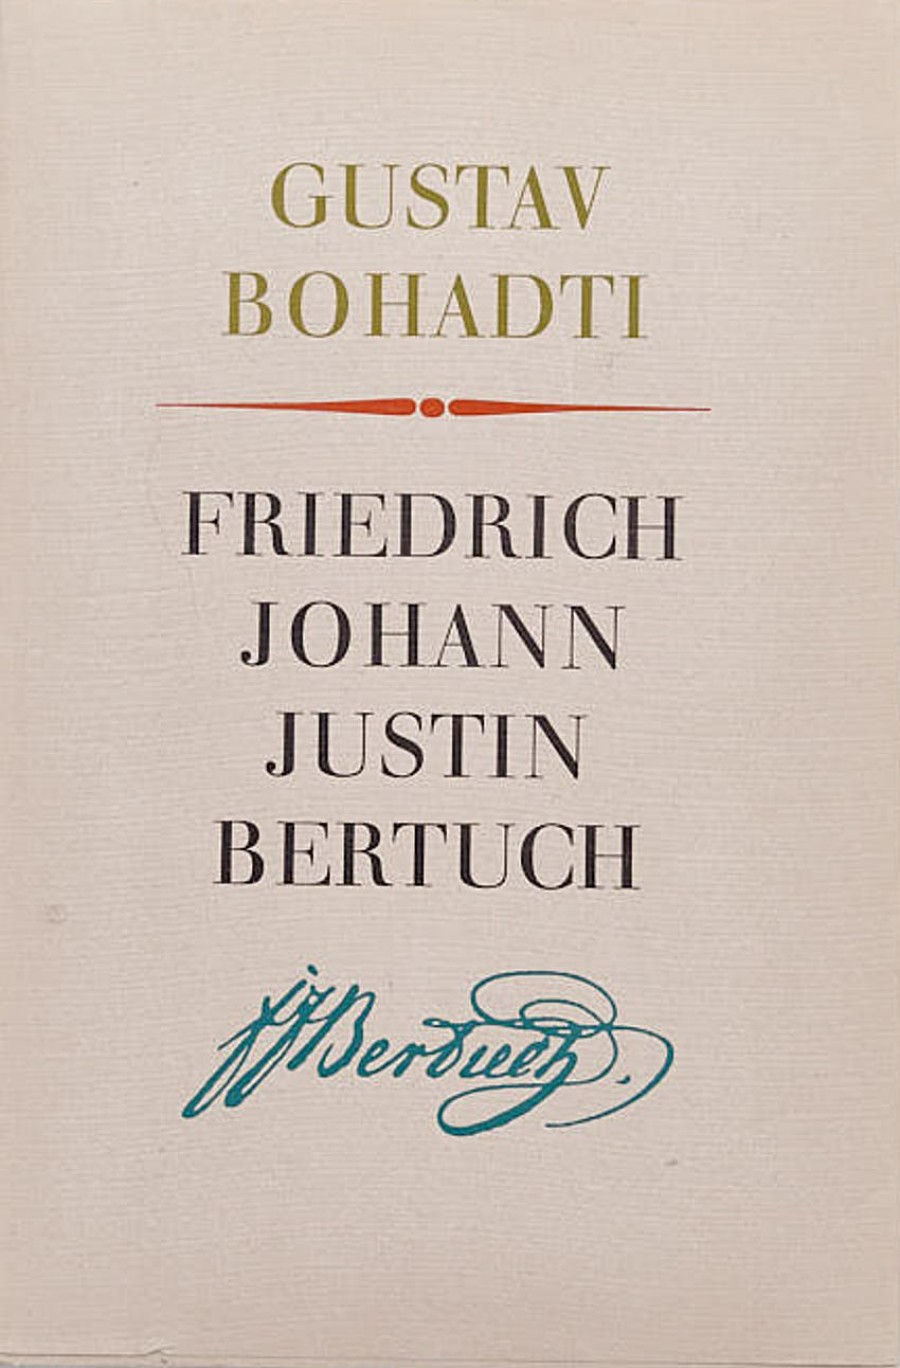 Gustav Bohadti:Friedrich Johann Justin Bertuch